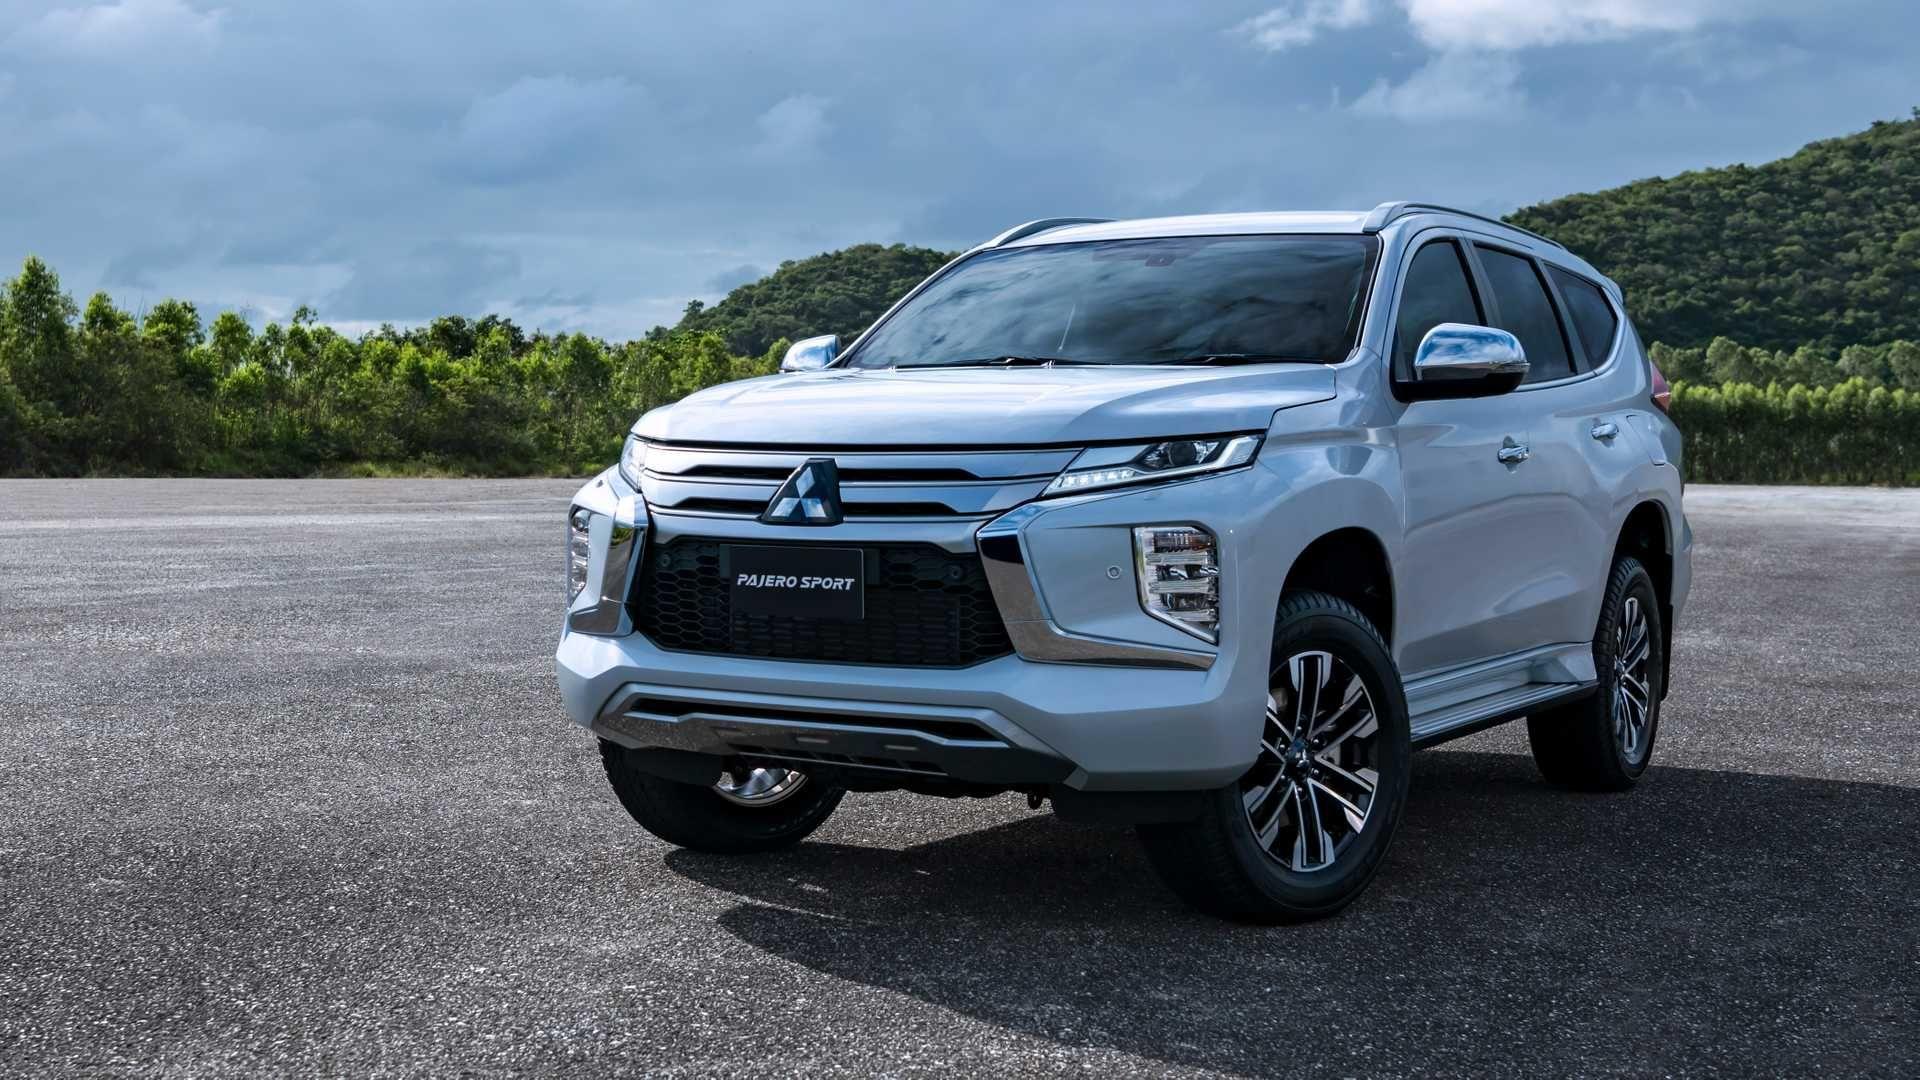 Along with the makeup operation, Mitsubishi Pajero Sport